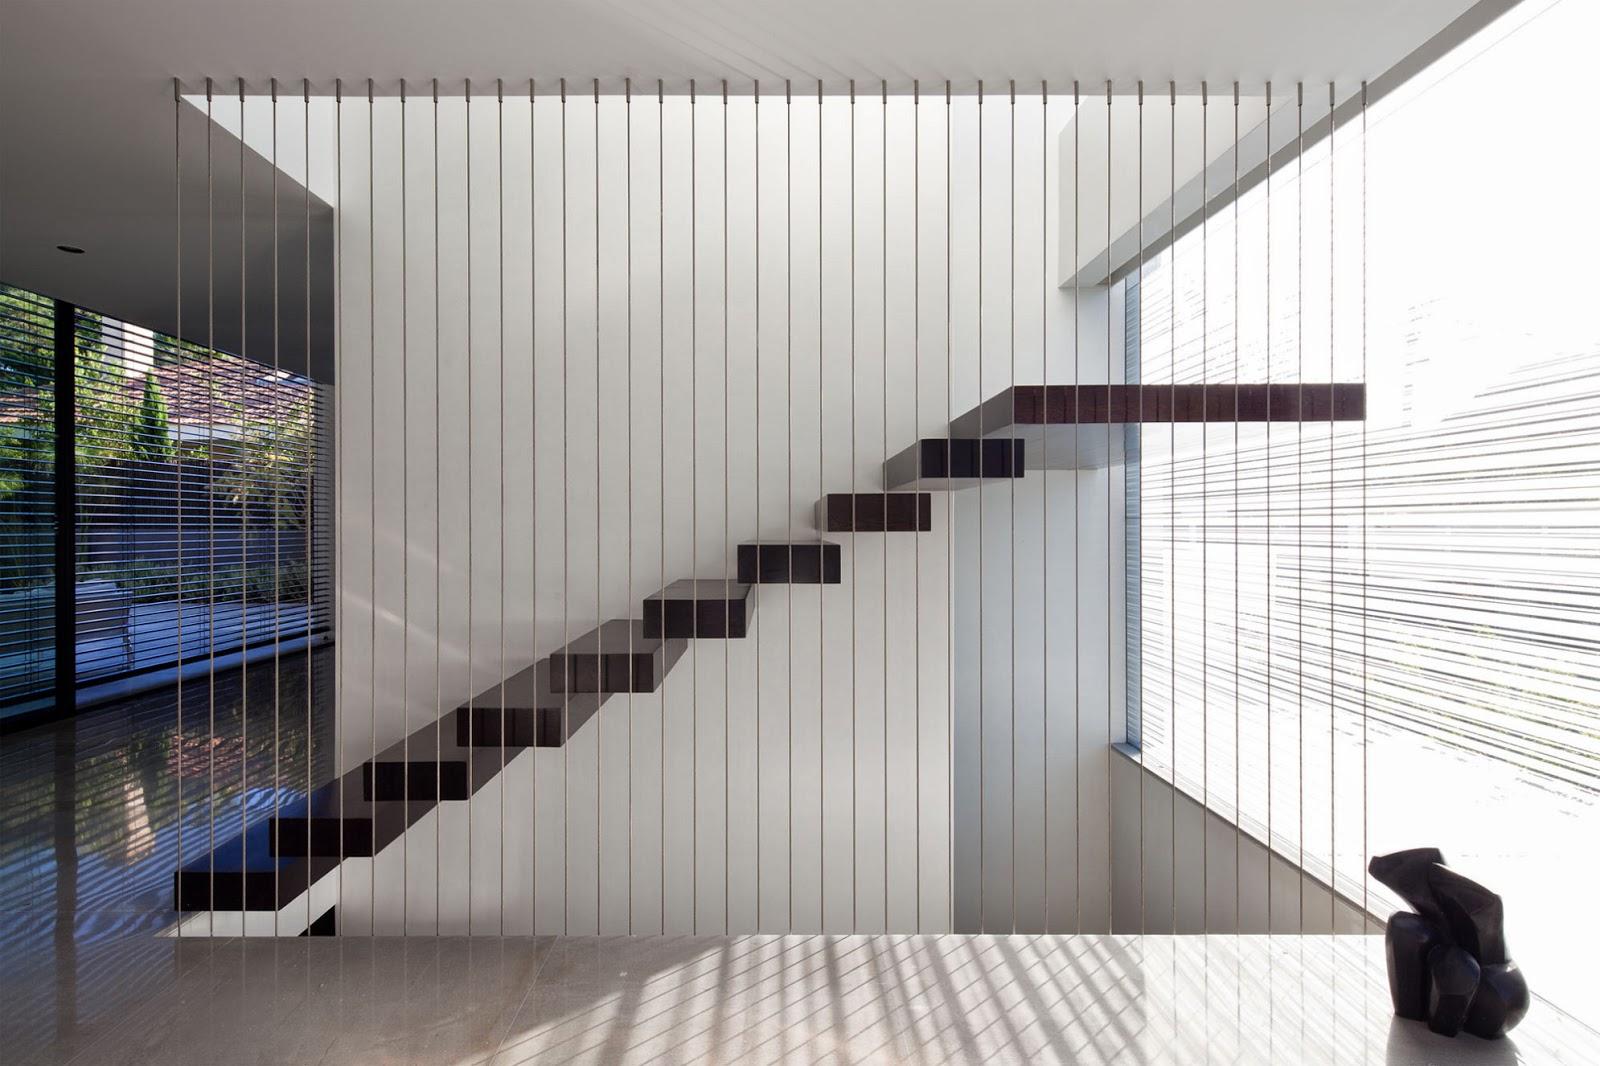 Gambar Rumah Mewah Minimalis Kontemporer